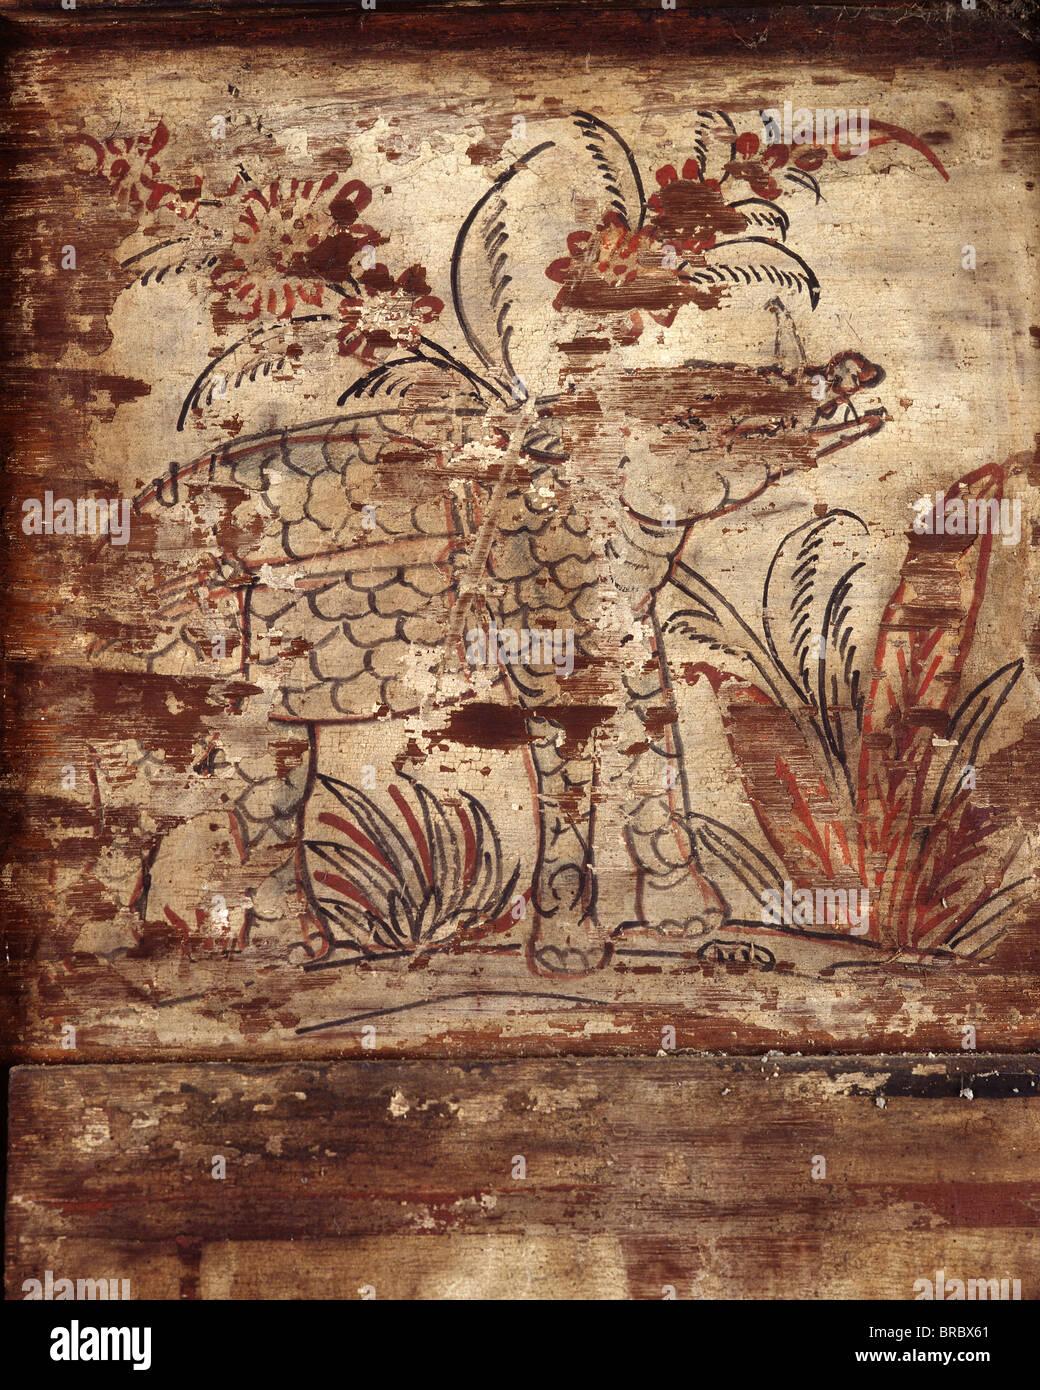 A rhino, detail of a mural from late Ayutthaya period in Wat Yai Suwannaram, Petchaburi, Thailand - Stock Image